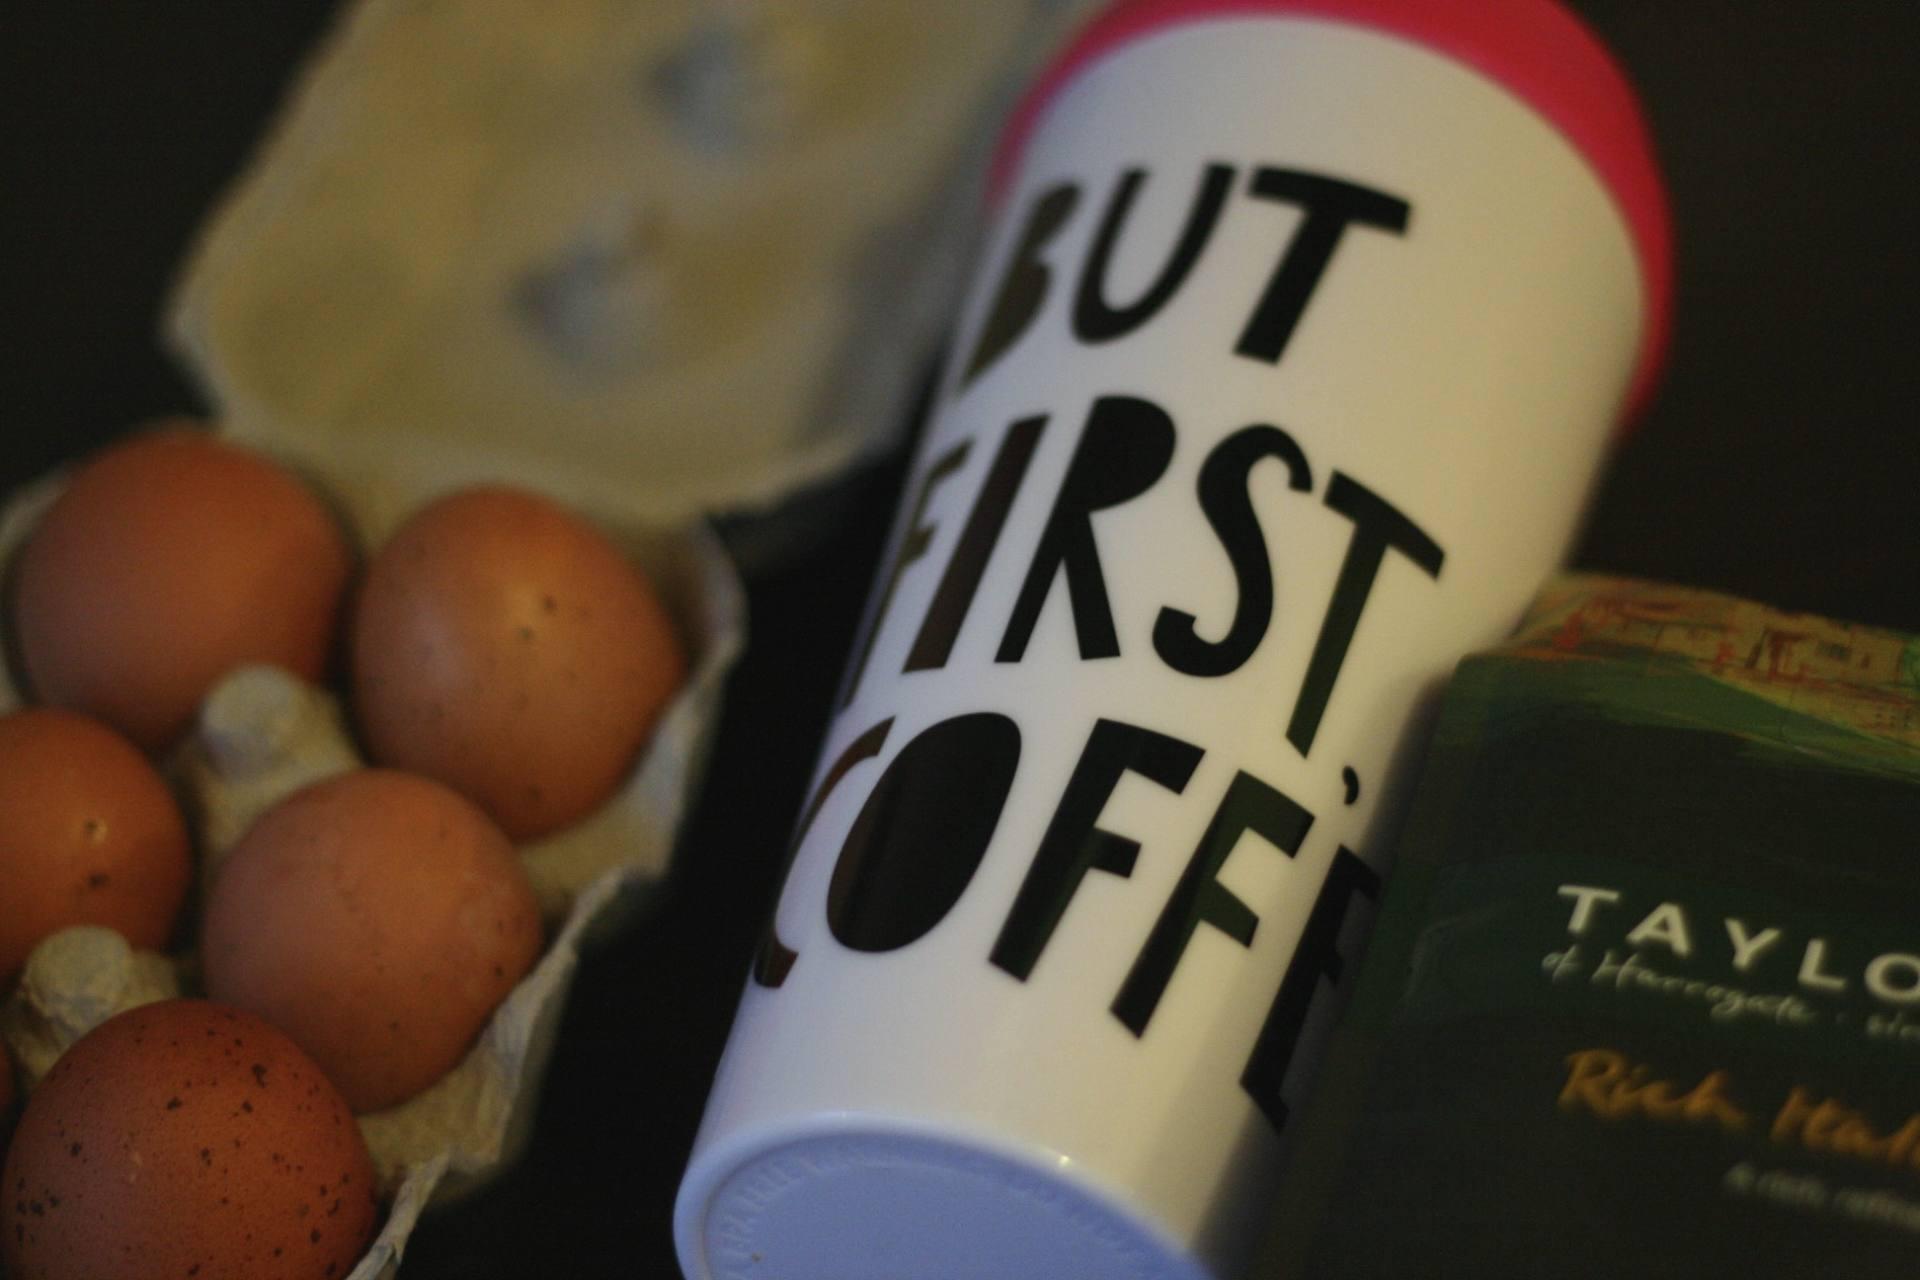 UK Coffee Week - But First Coffee